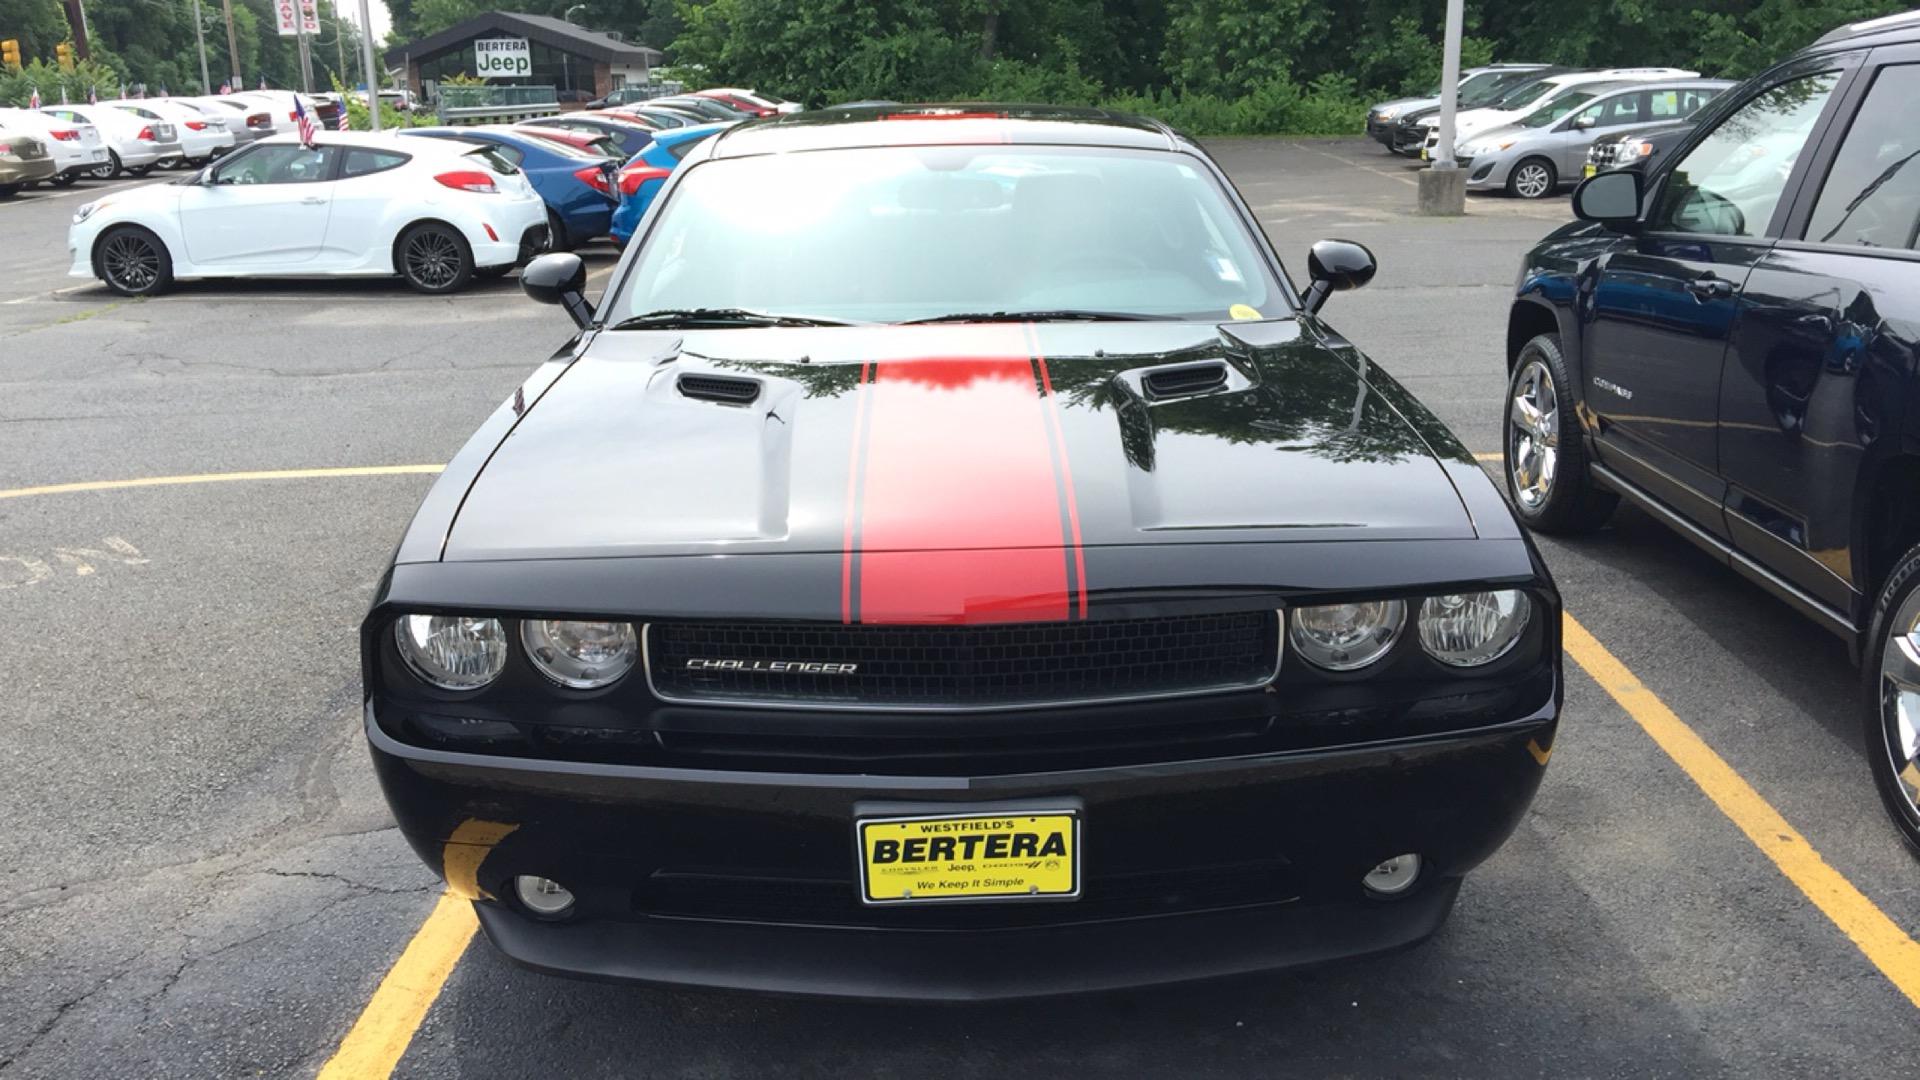 Bertera Dodge Westfield Ma | 2018 Dodge Reviews